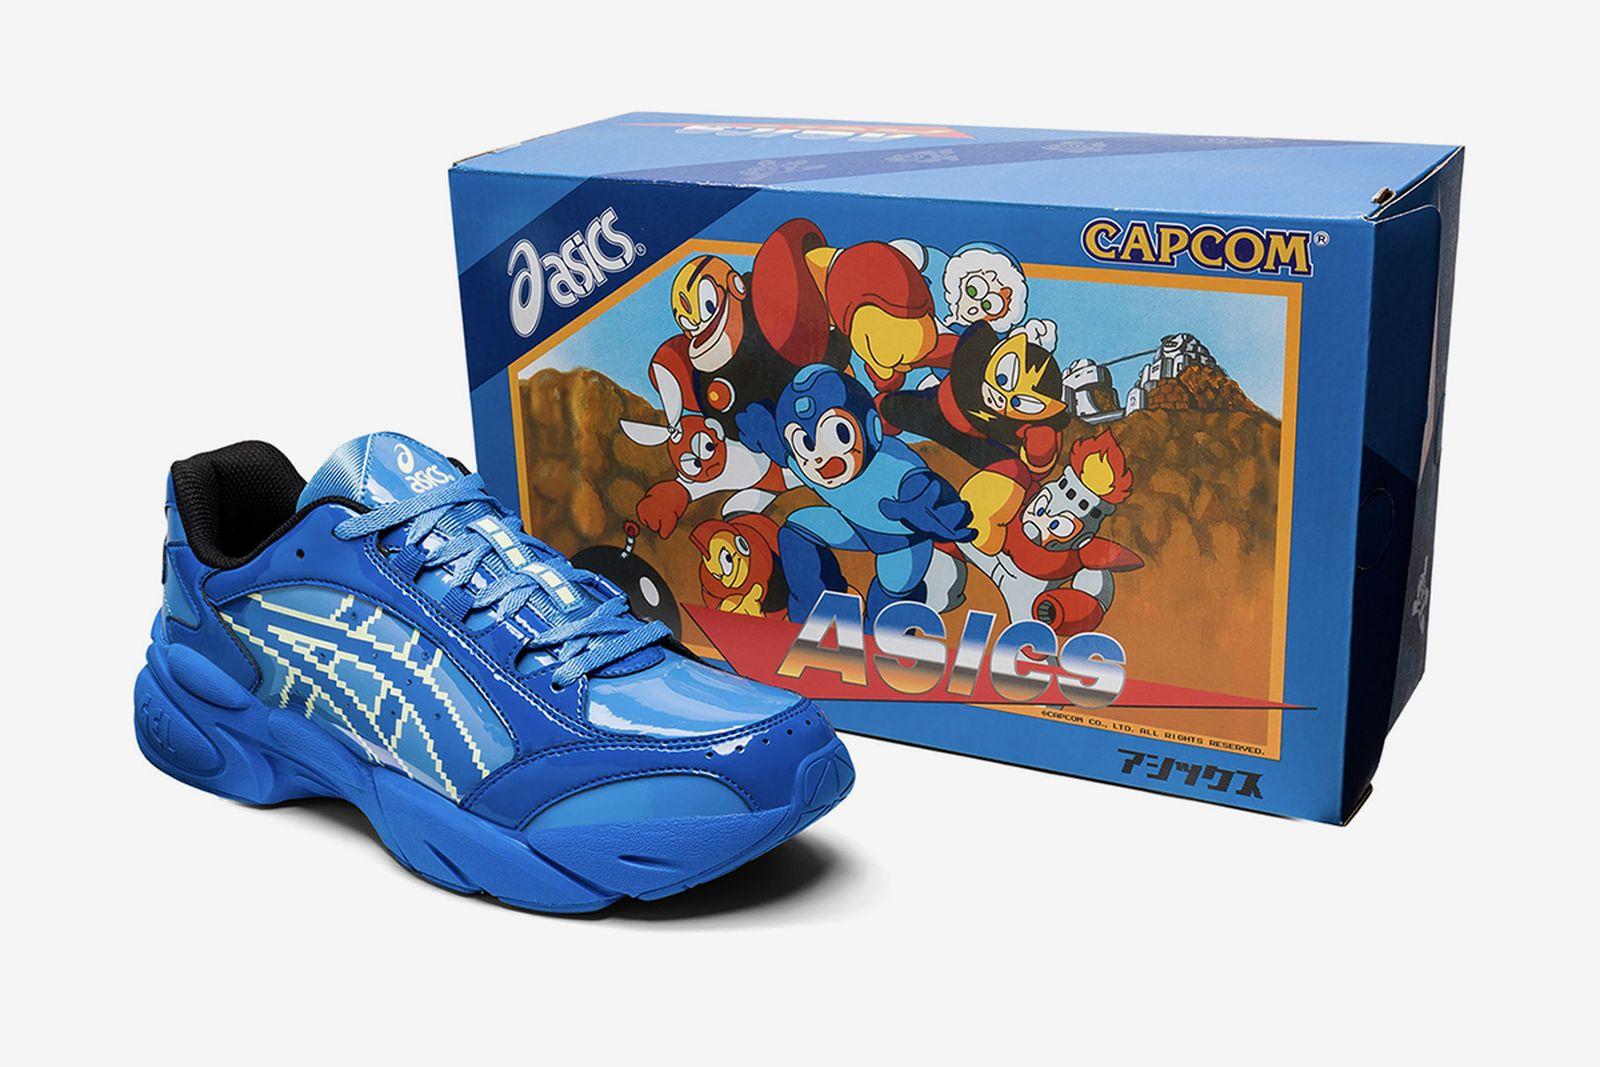 Capcom x ASICS GEL-BND